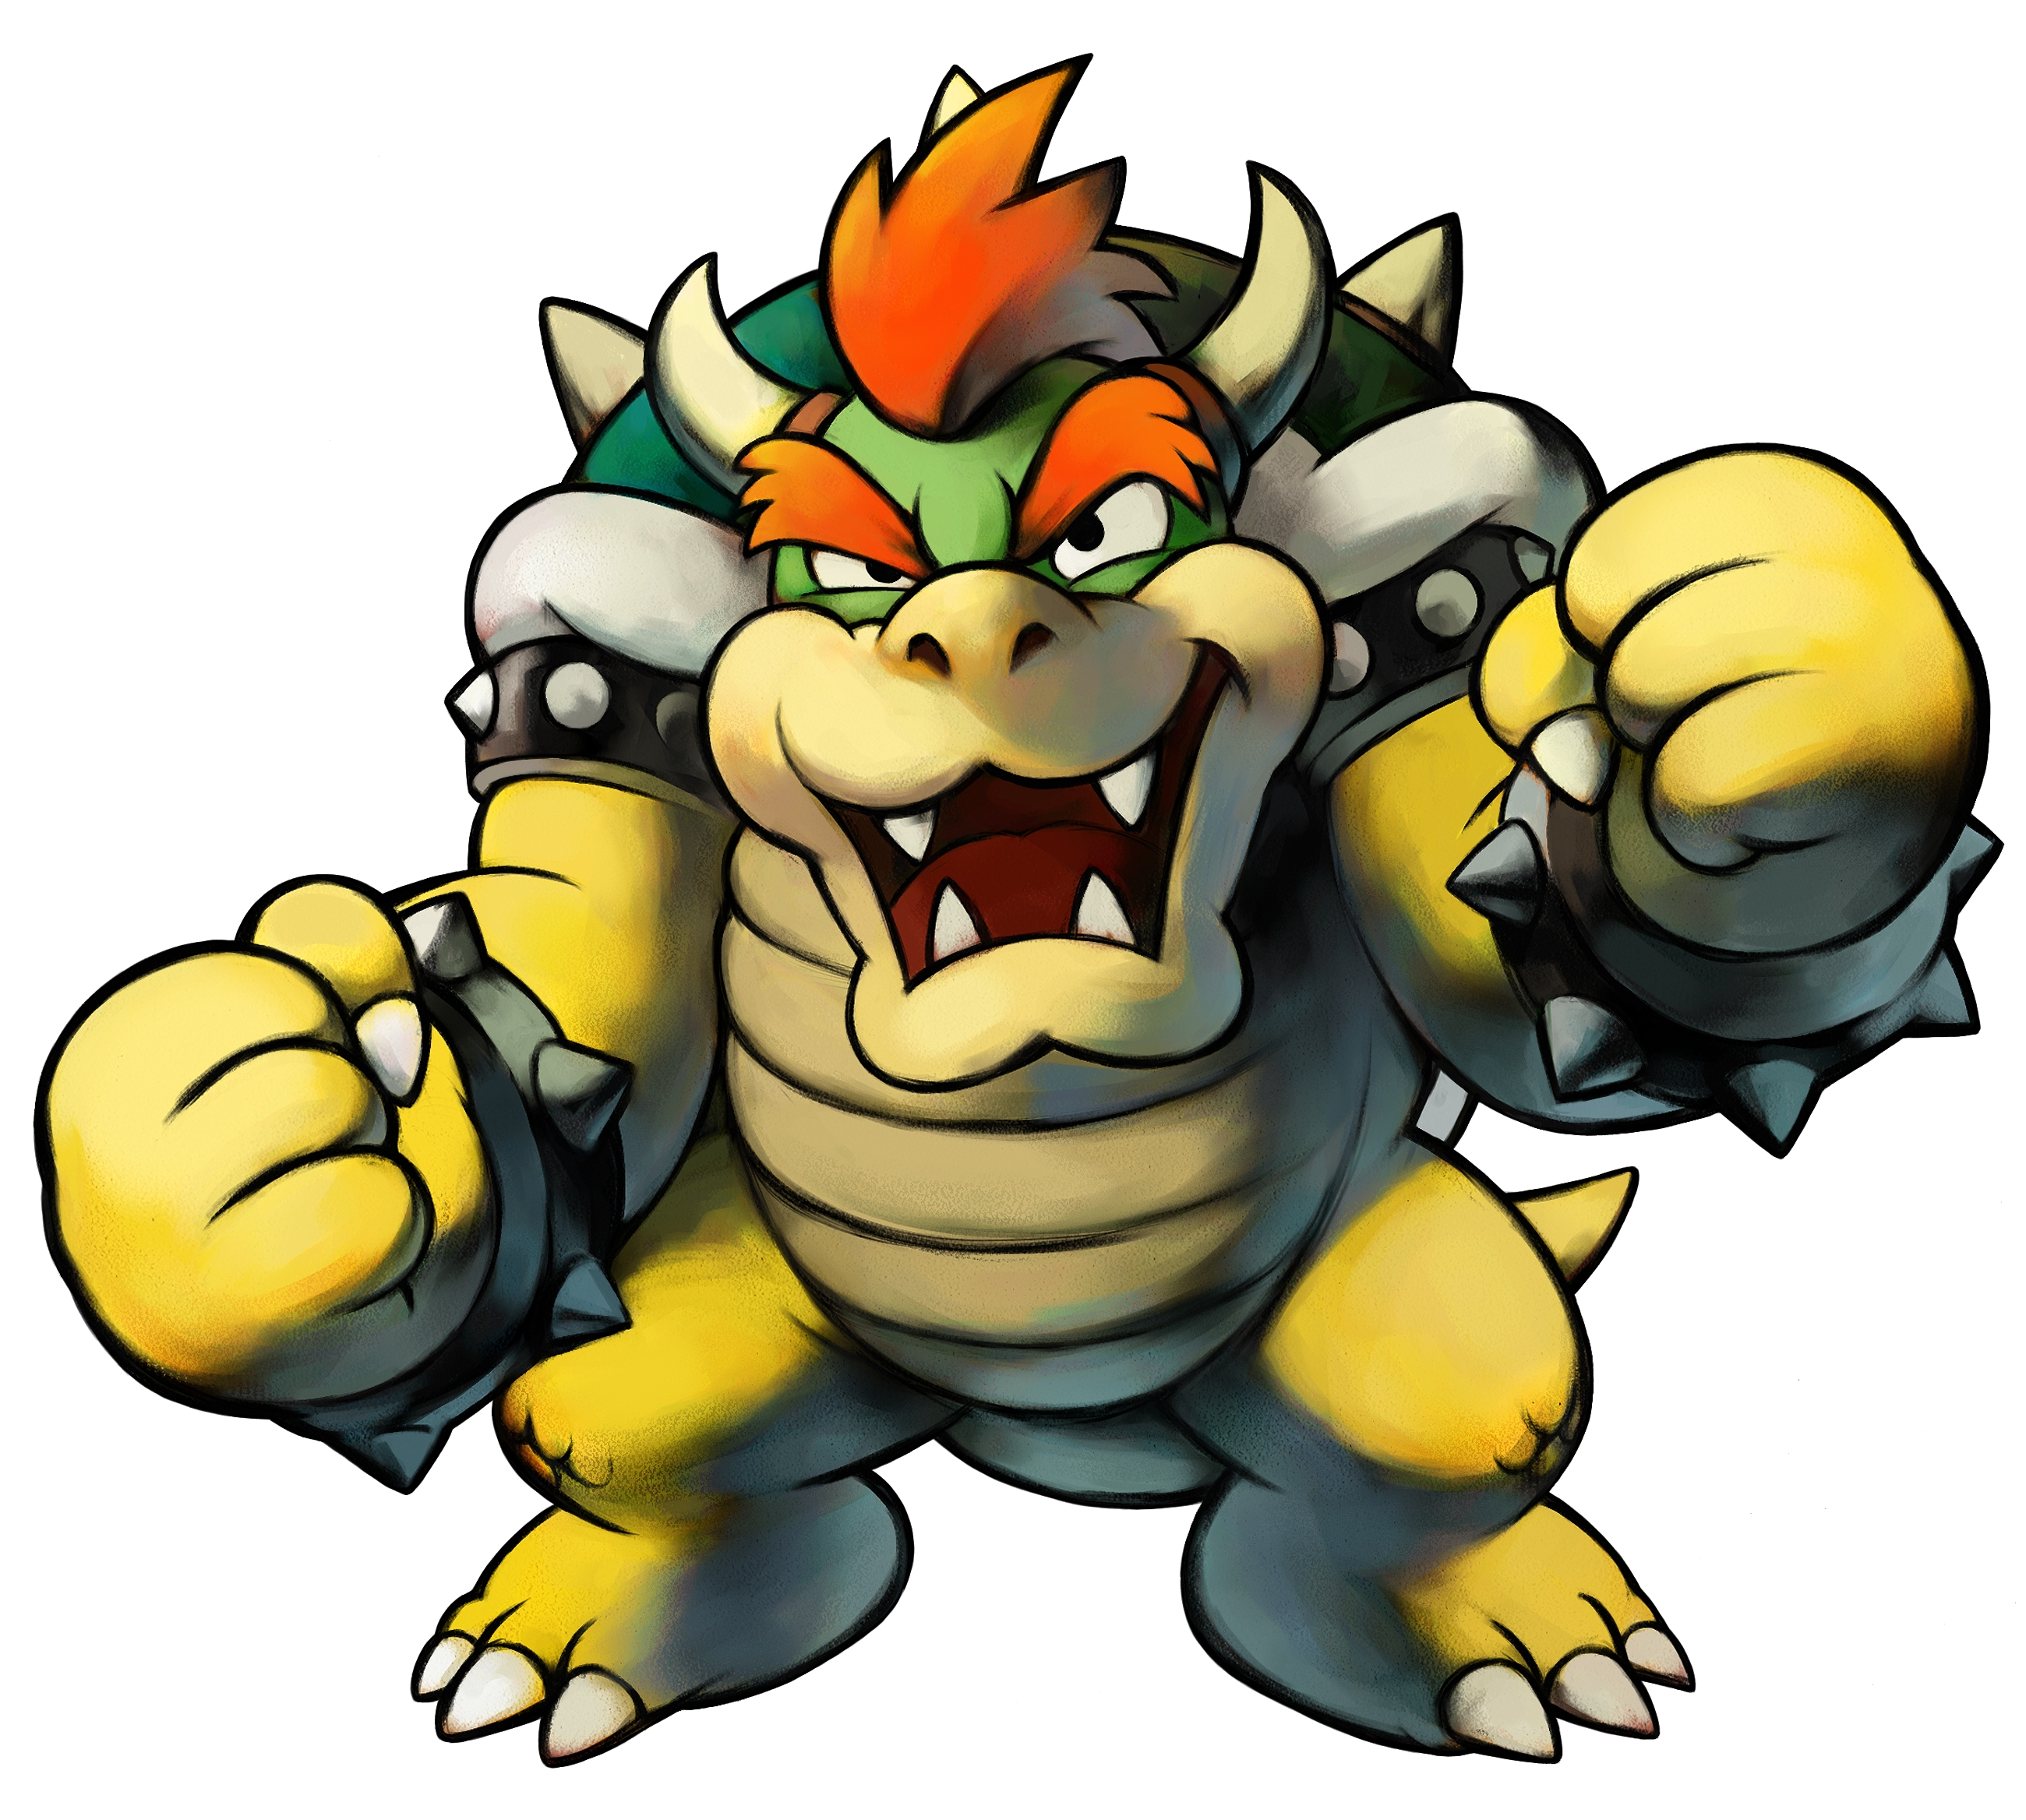 2600x2336 Tmk Downloads Images Mario Amp Luigi Superstar Saga (Gba)